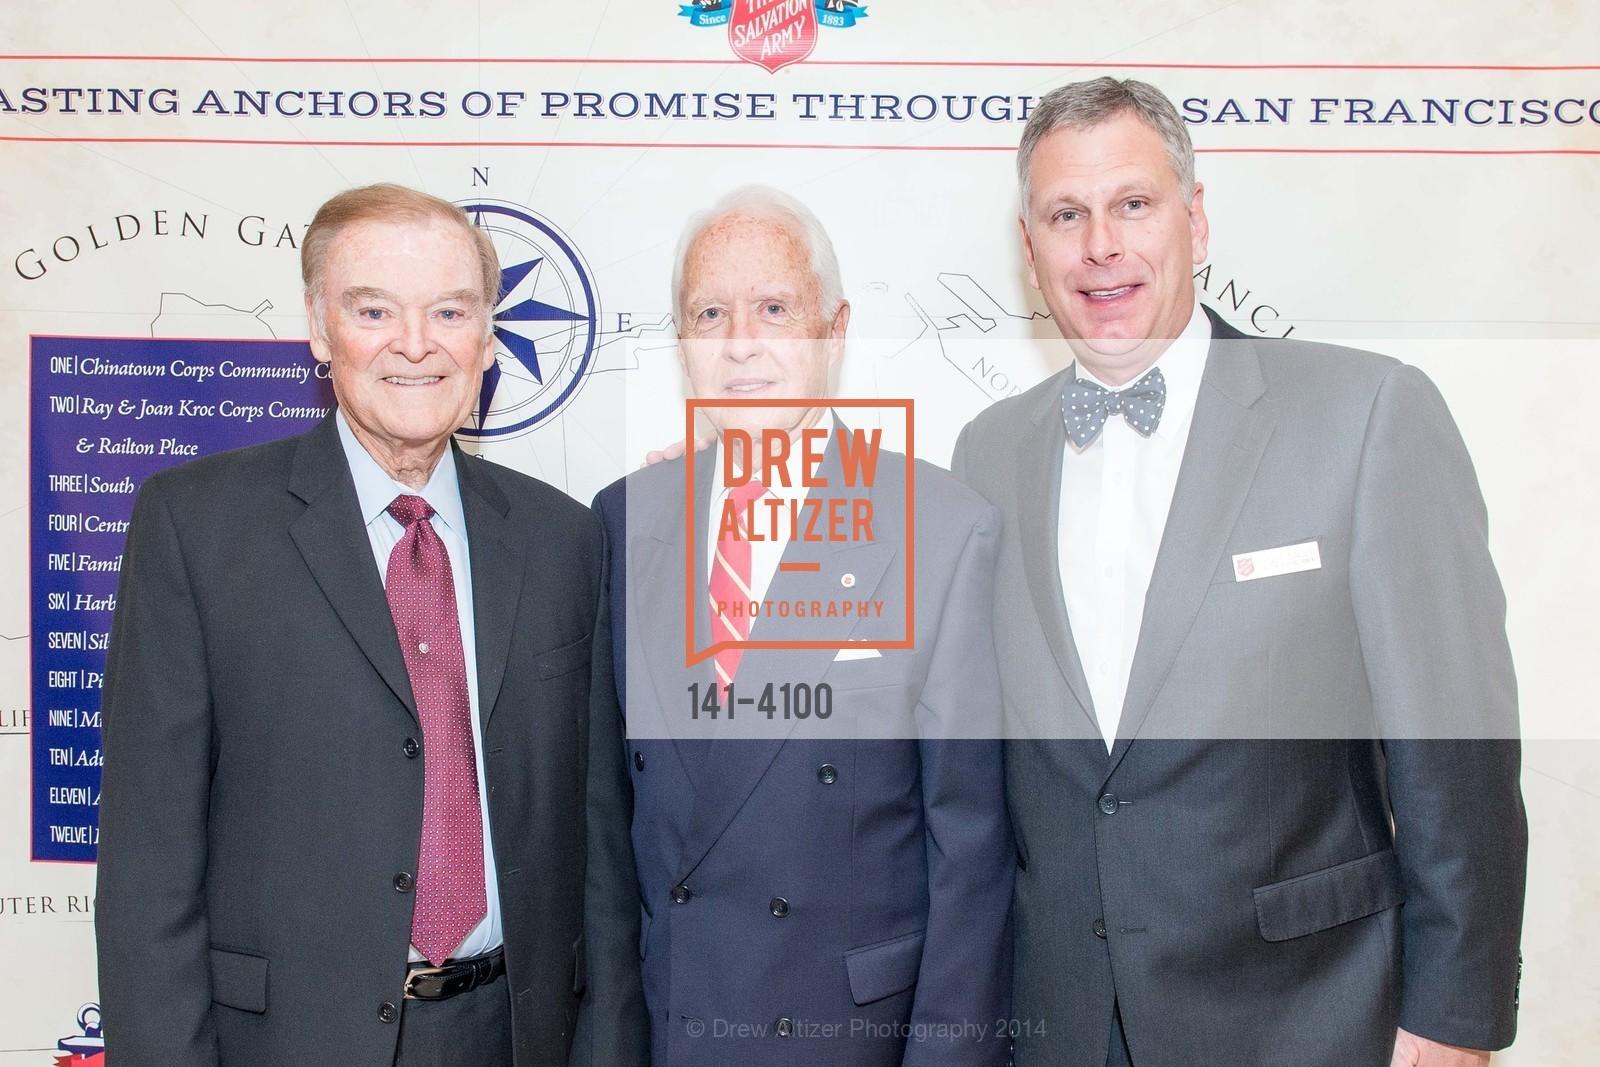 The Honorable Mayor Frank Jordan, RADM John Bitoff, Ernst Bauer, Photo #141-4100